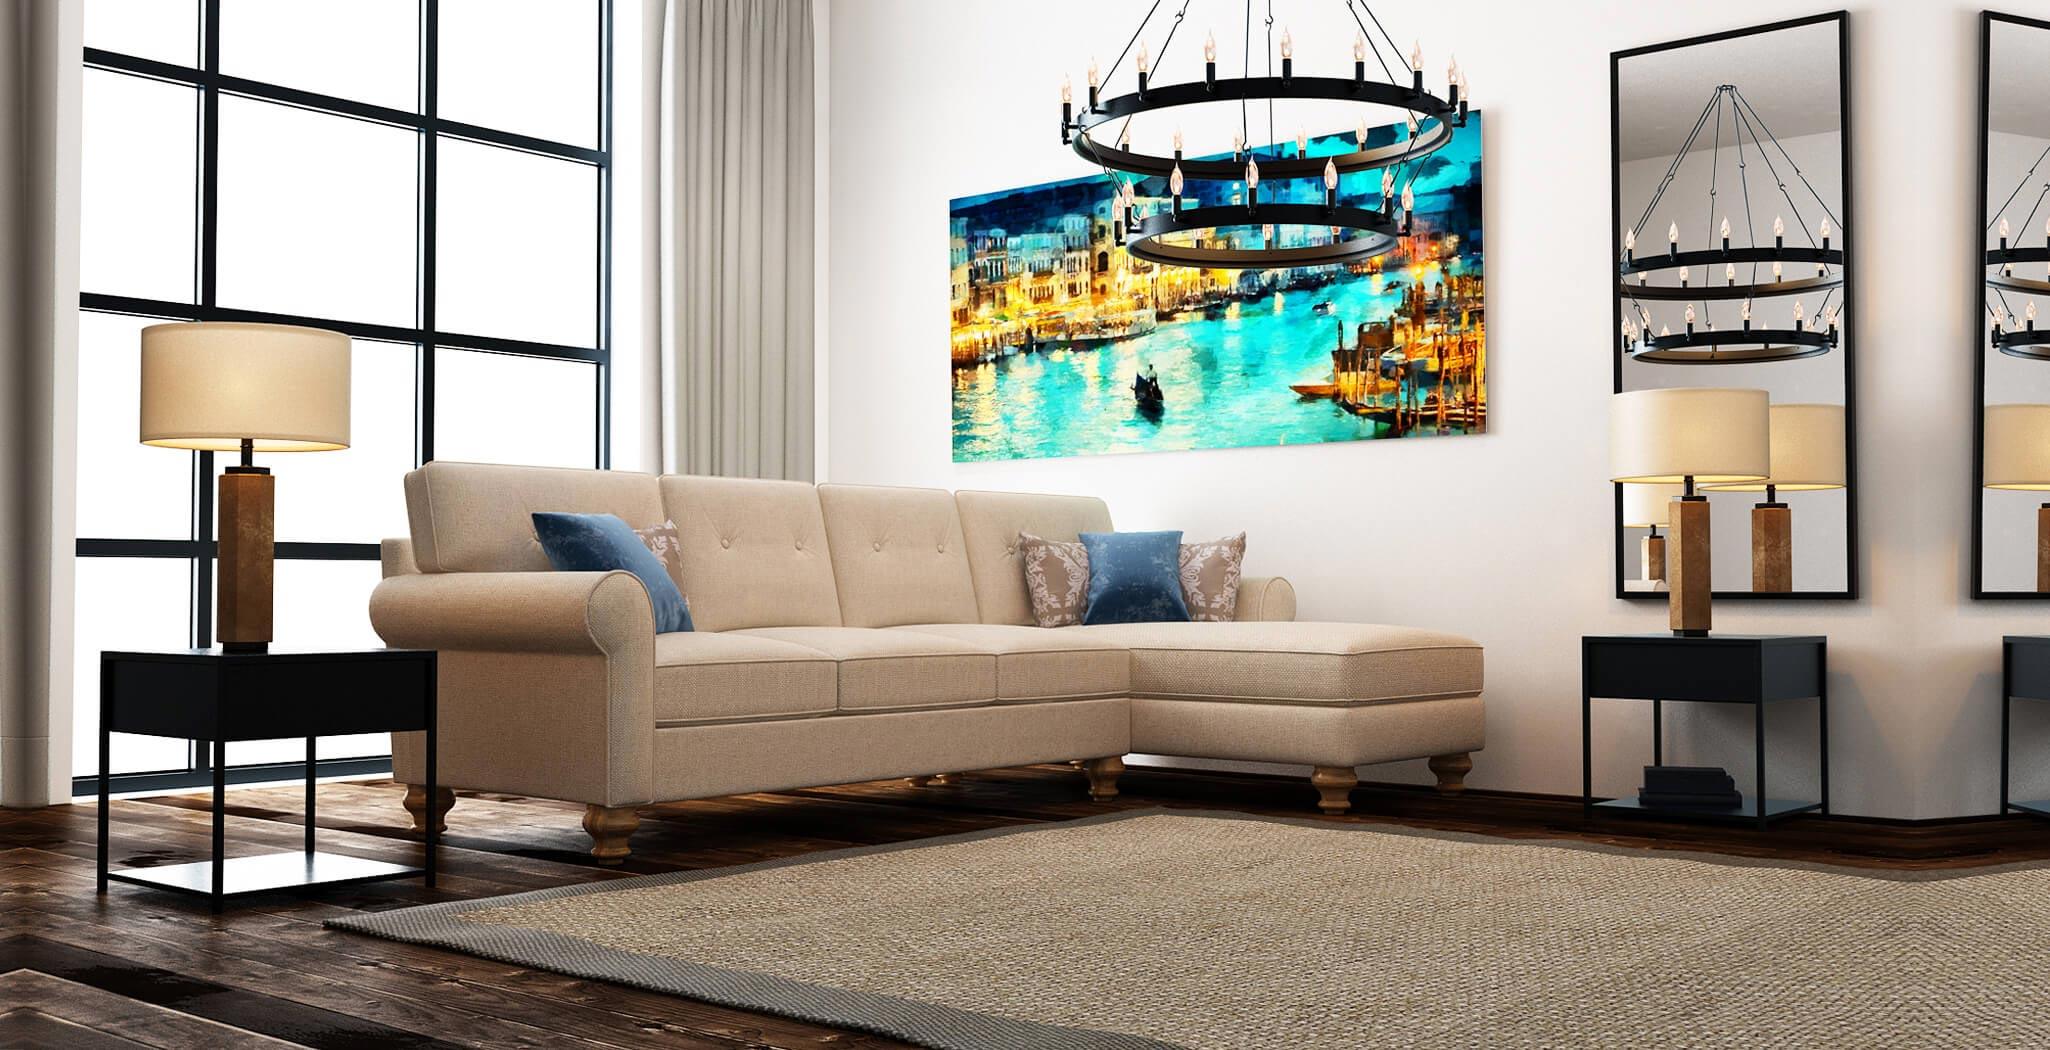 farah panel furniture gallery 1